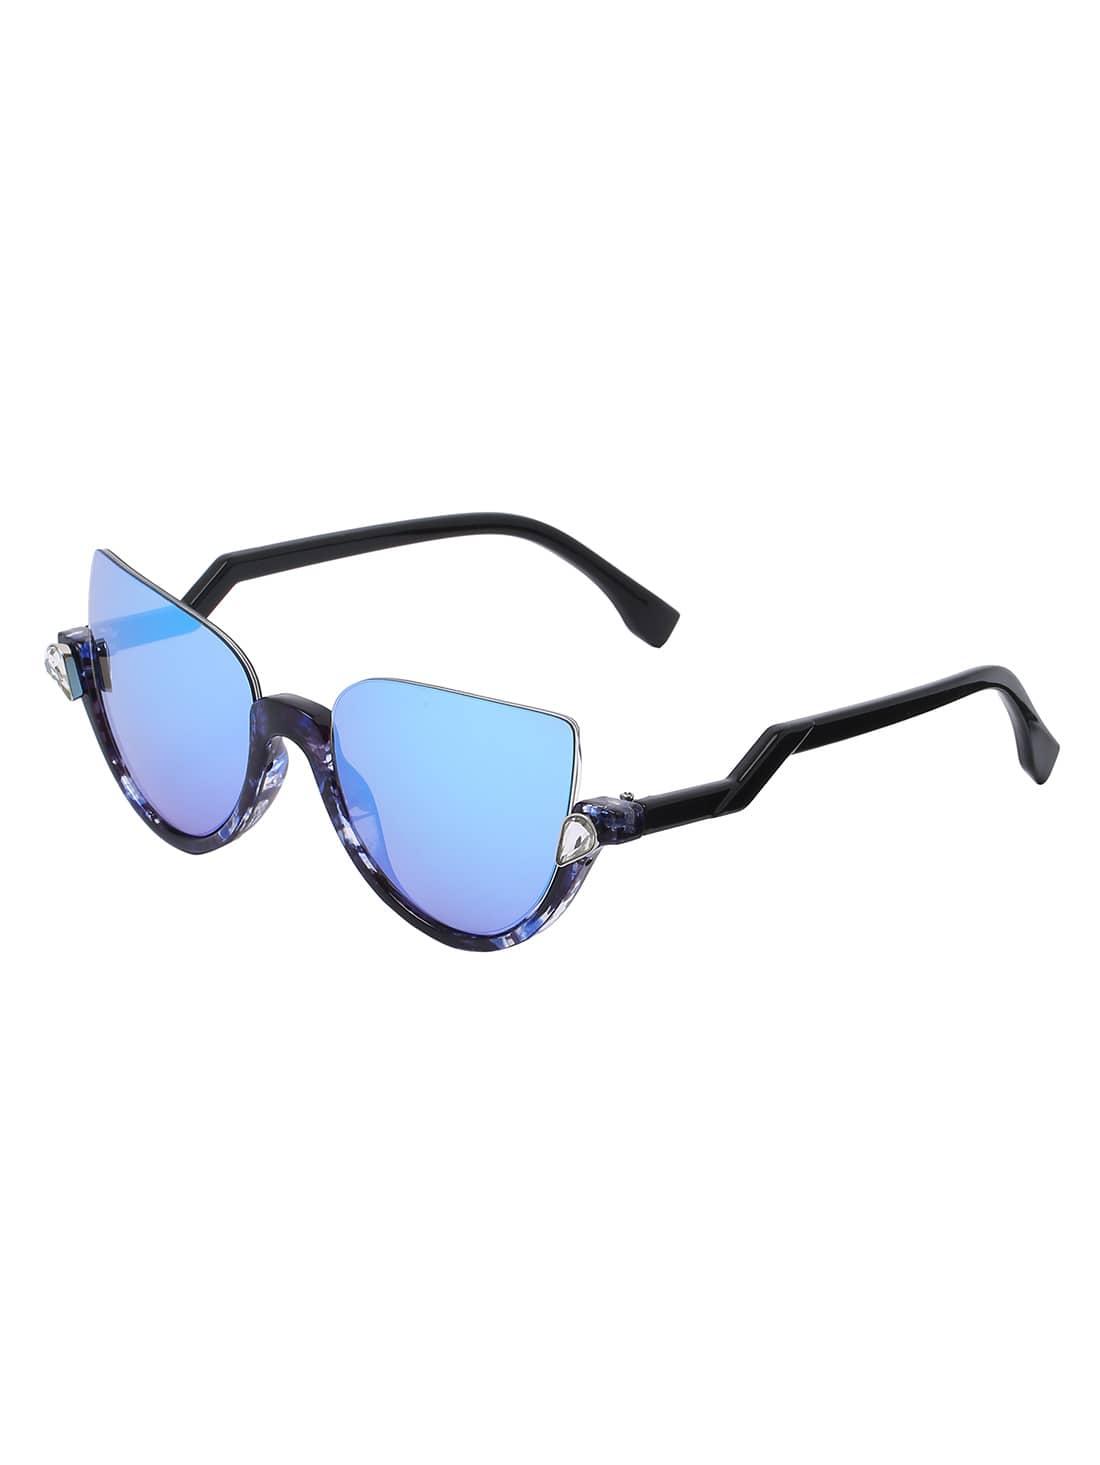 Half Frame Cat Glasses : Cat Eye Blue Half Frame Sunglasses -SheIn(Sheinside)